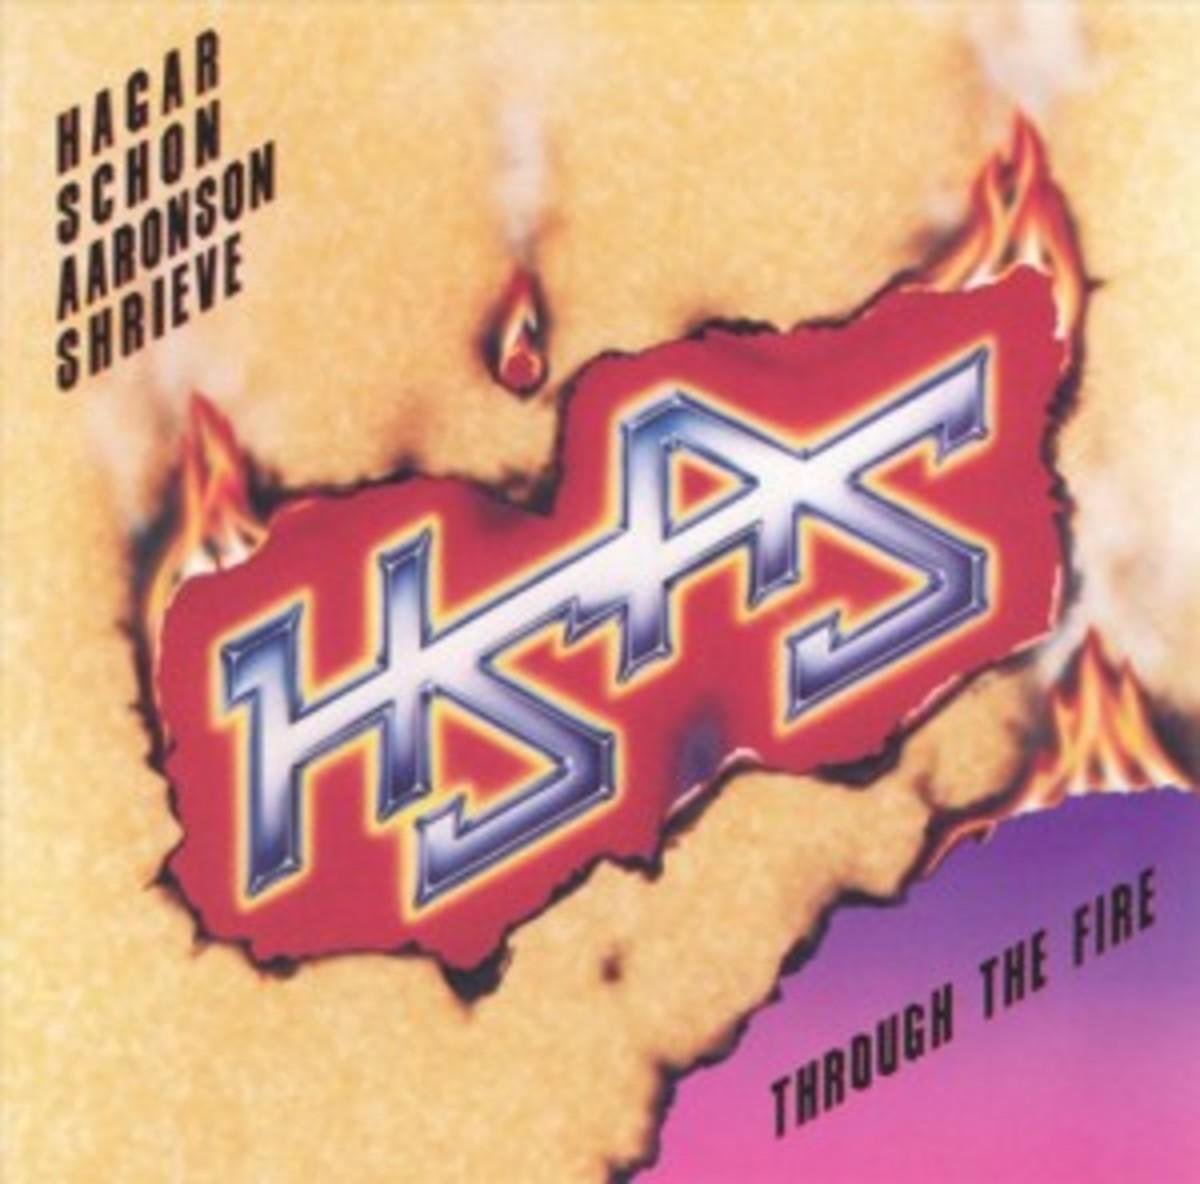 HSAS_ThroughTheFire